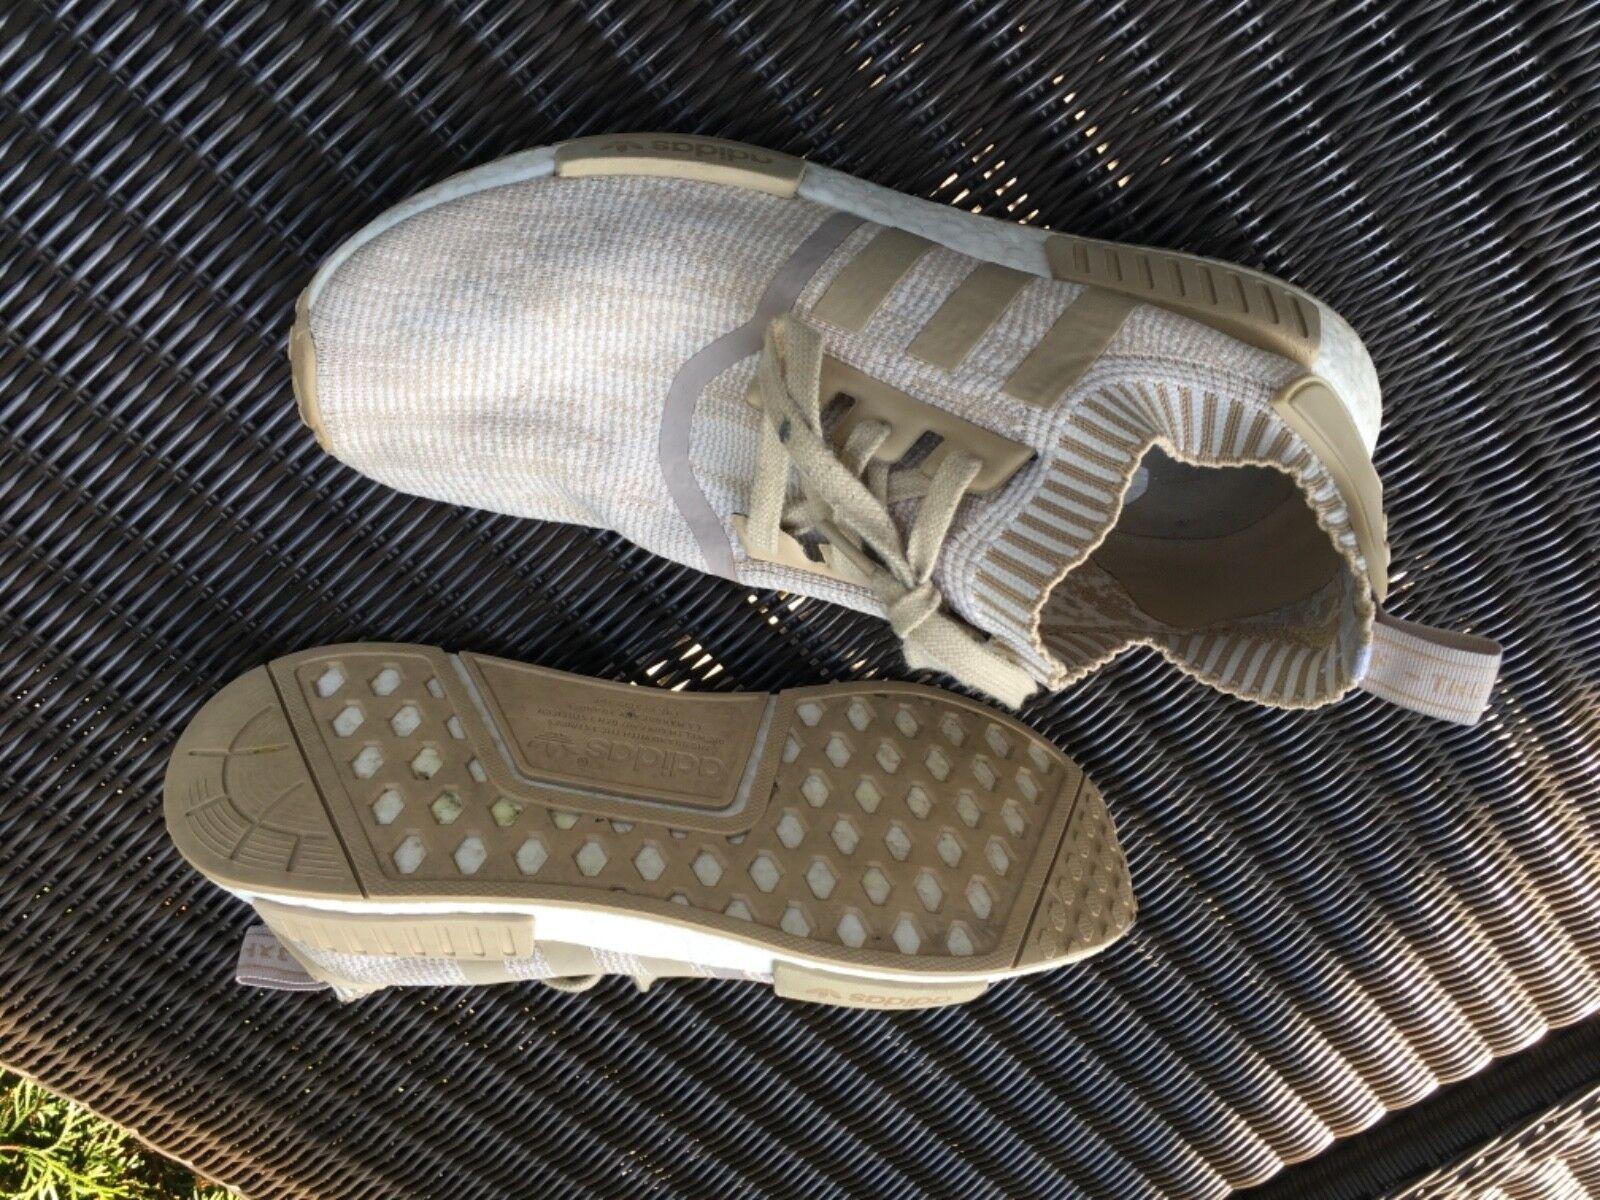 Adidas NMD Herren-/Damensneaker Boost Khaki Primeknit 12 - 461/3